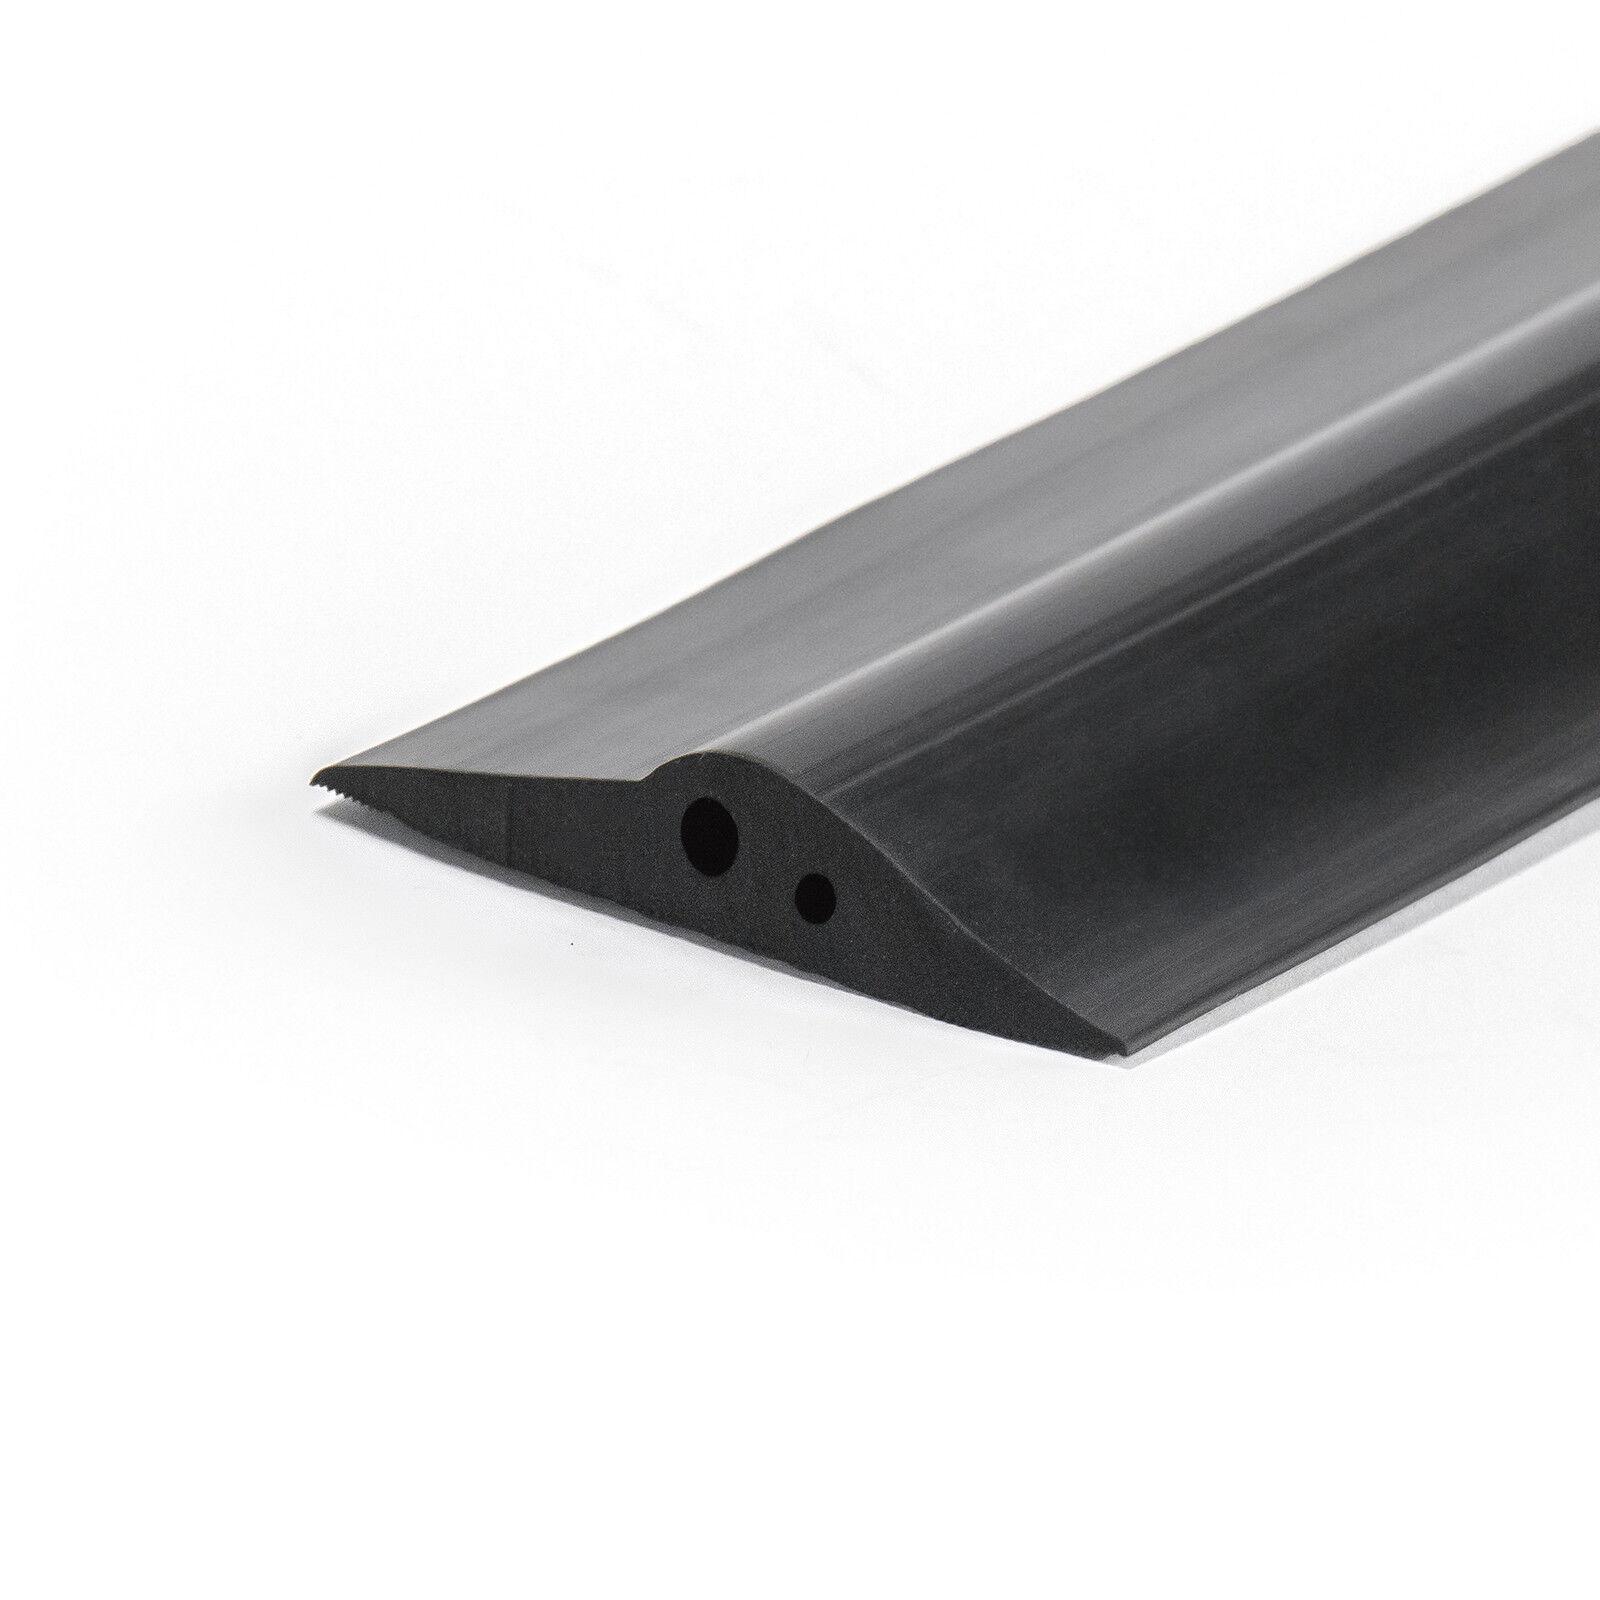 80 Mm x 15 mm Sello de Goma umbral de garaje suelo puerta de tiro para corrientes clima